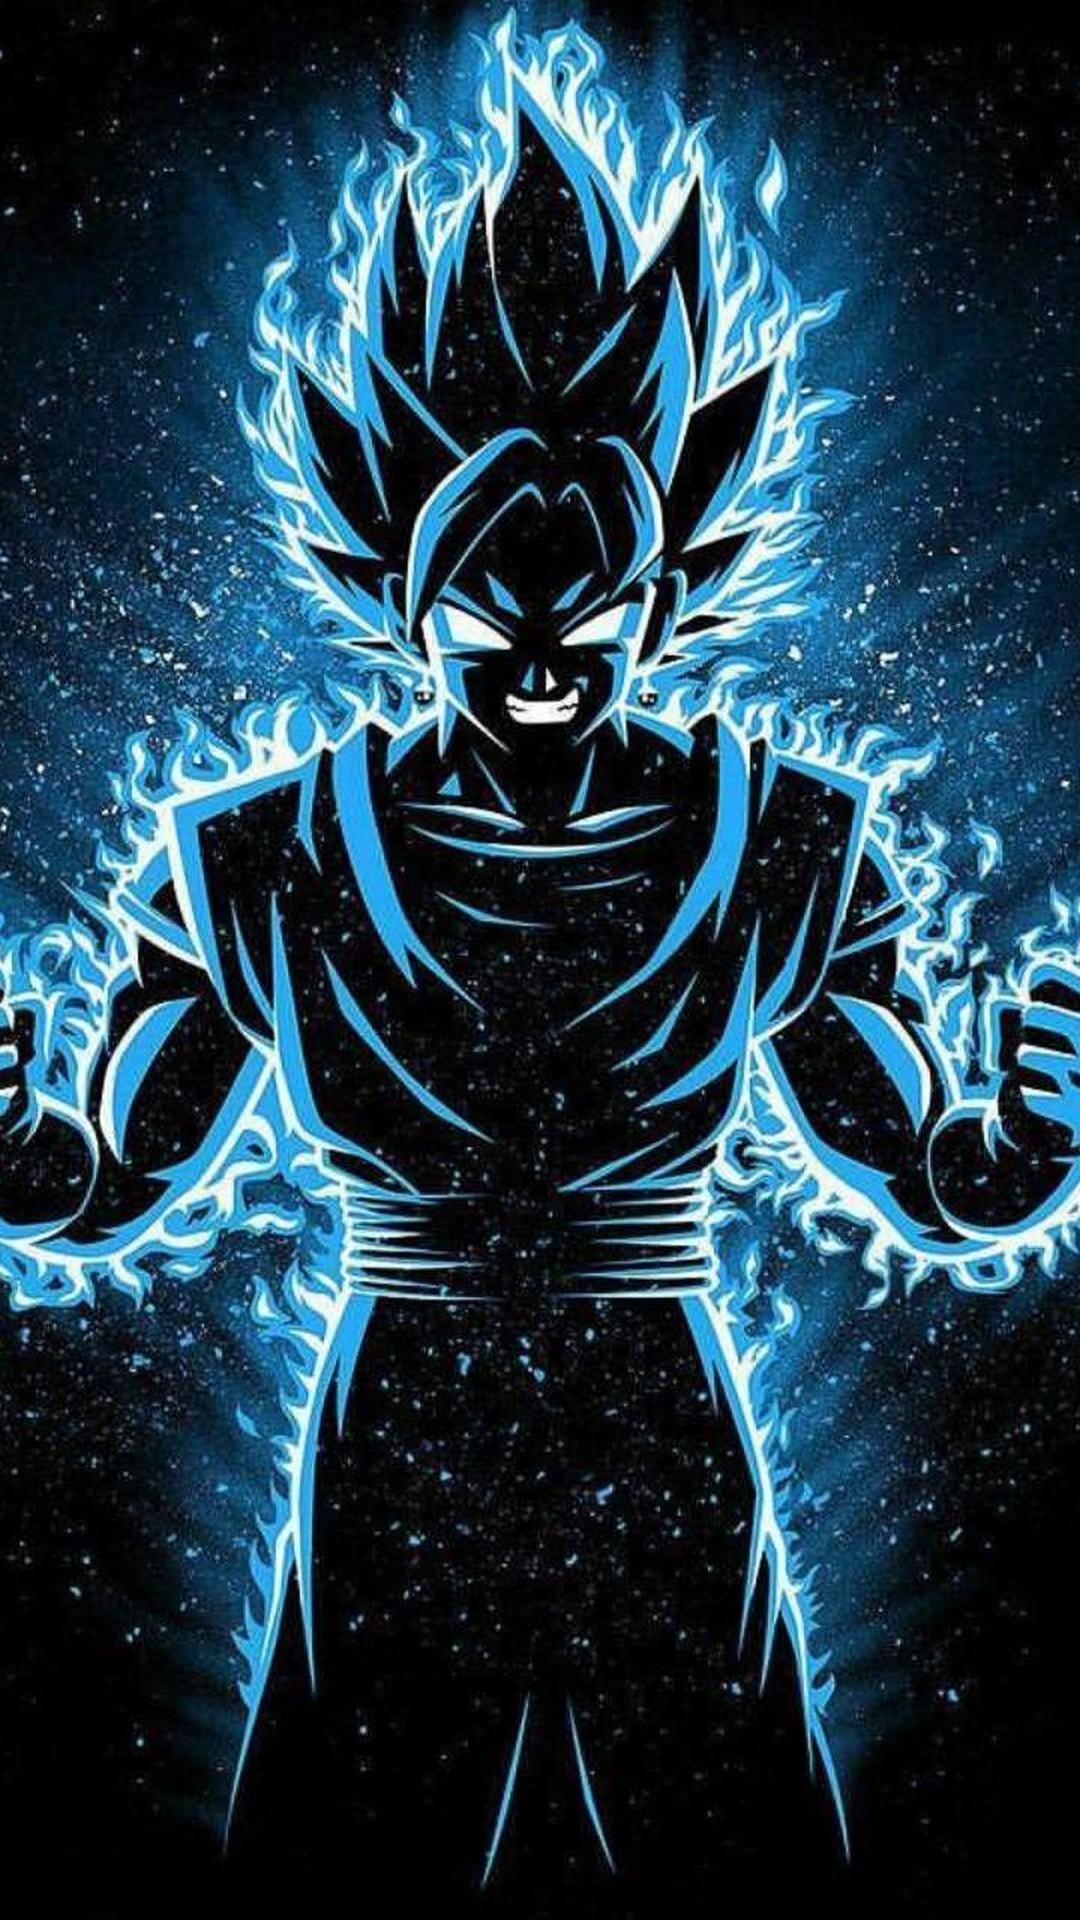 Wallpapers Black Goku With Image Resolution Pixel Dark